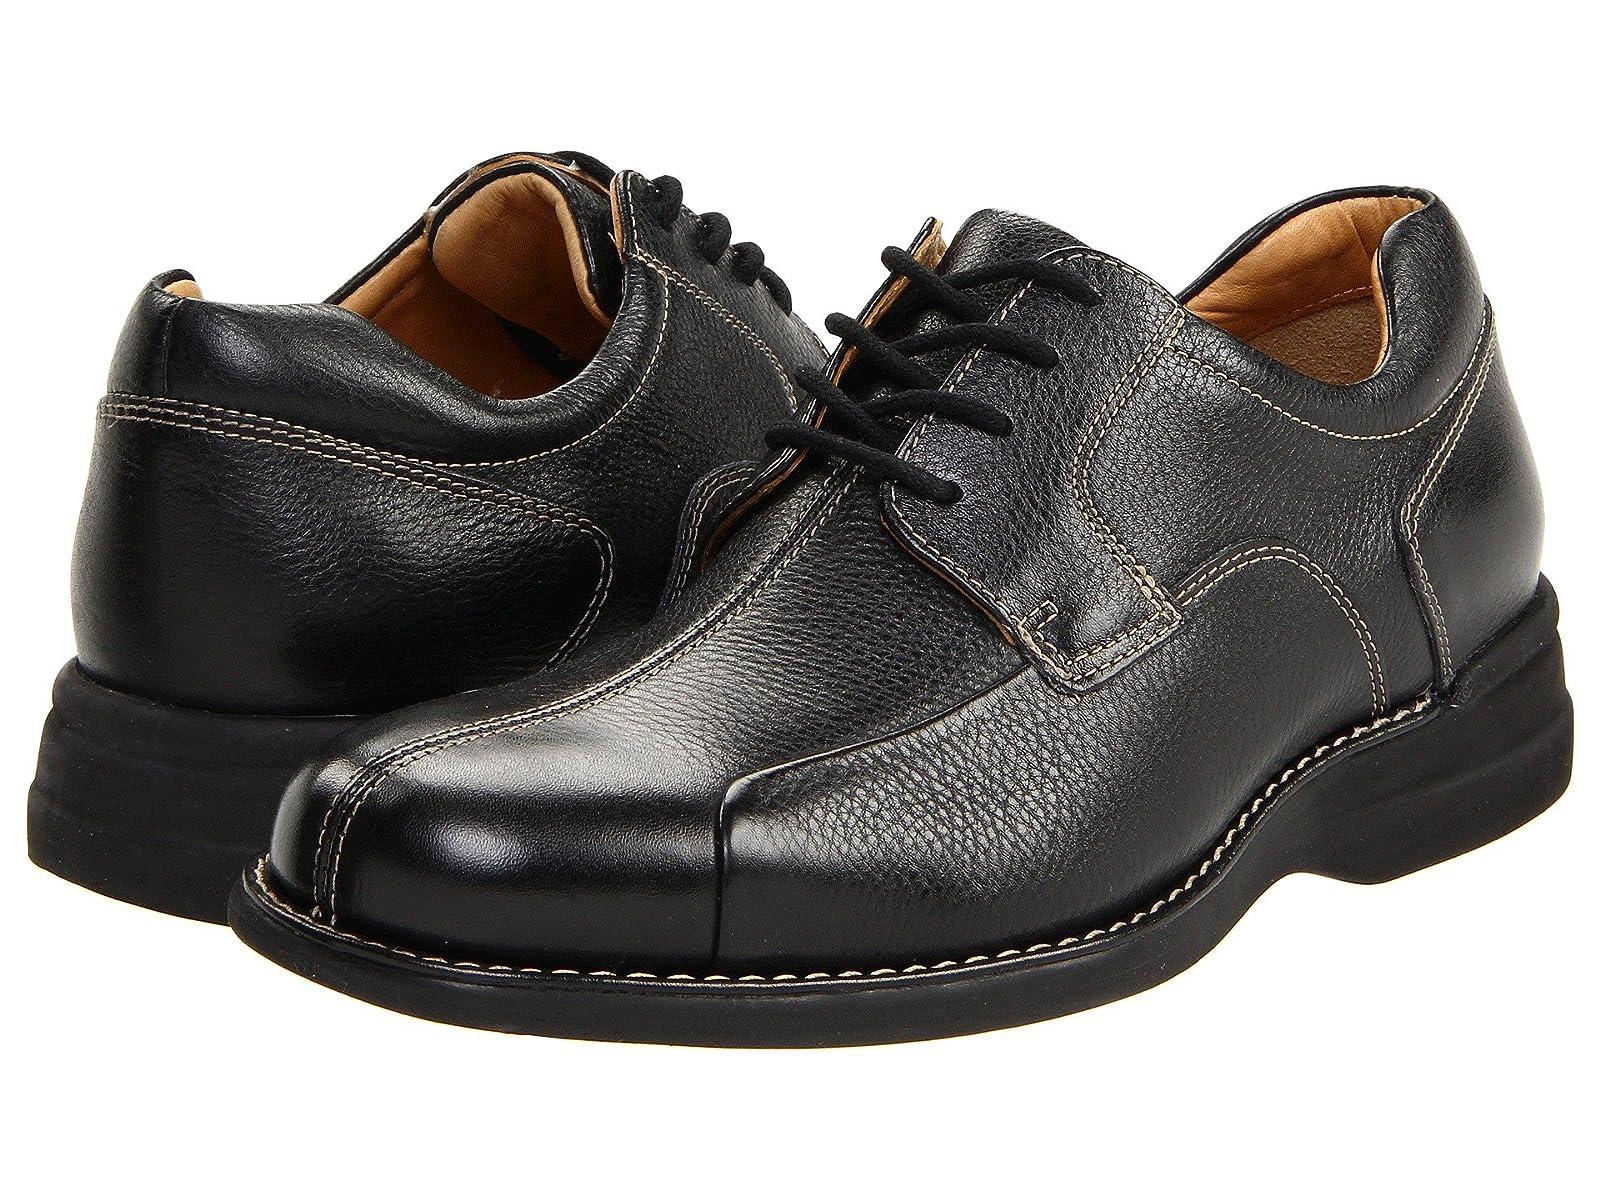 Johnston & Murphy Shuler Causal Dress Bike Toe OxfordAtmospheric grades have affordable shoes